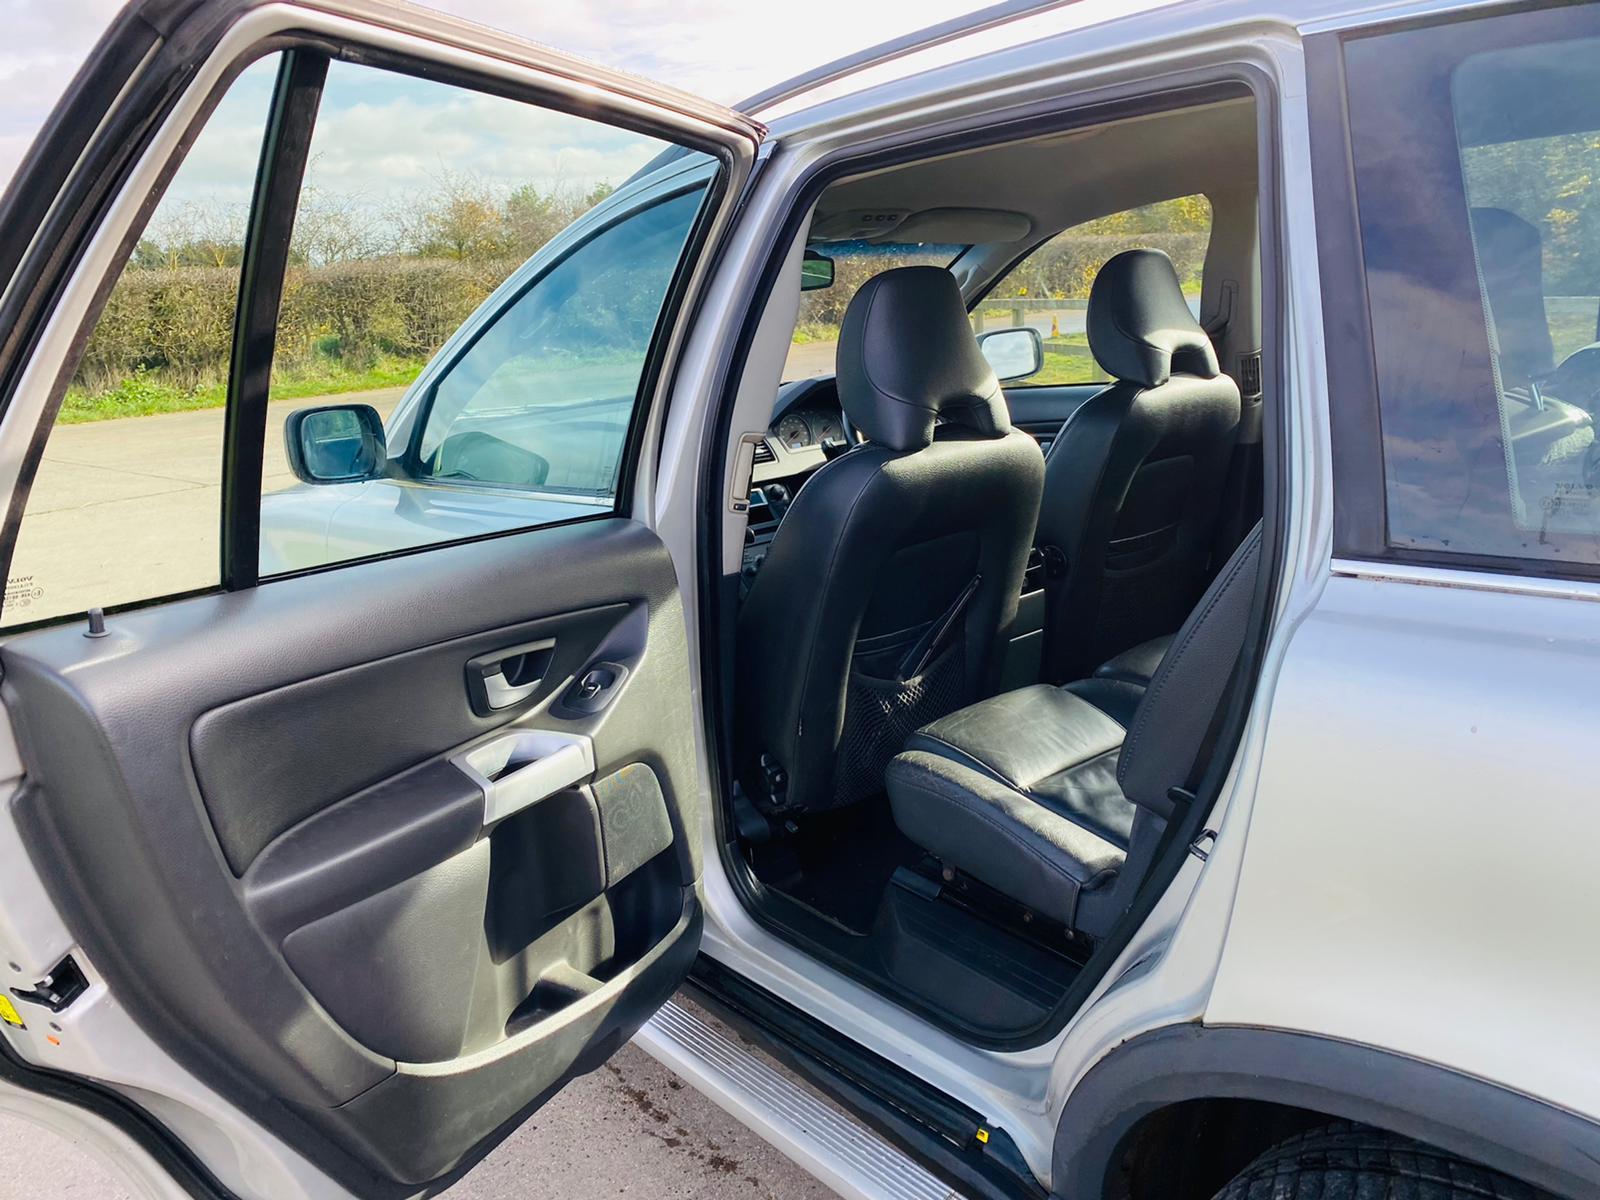 Volvo XC90 2.4 D5 185bhp SE Geartronic Auto 2006 06 Reg - 7 Seats - Air con - Top Spec - Image 40 of 47